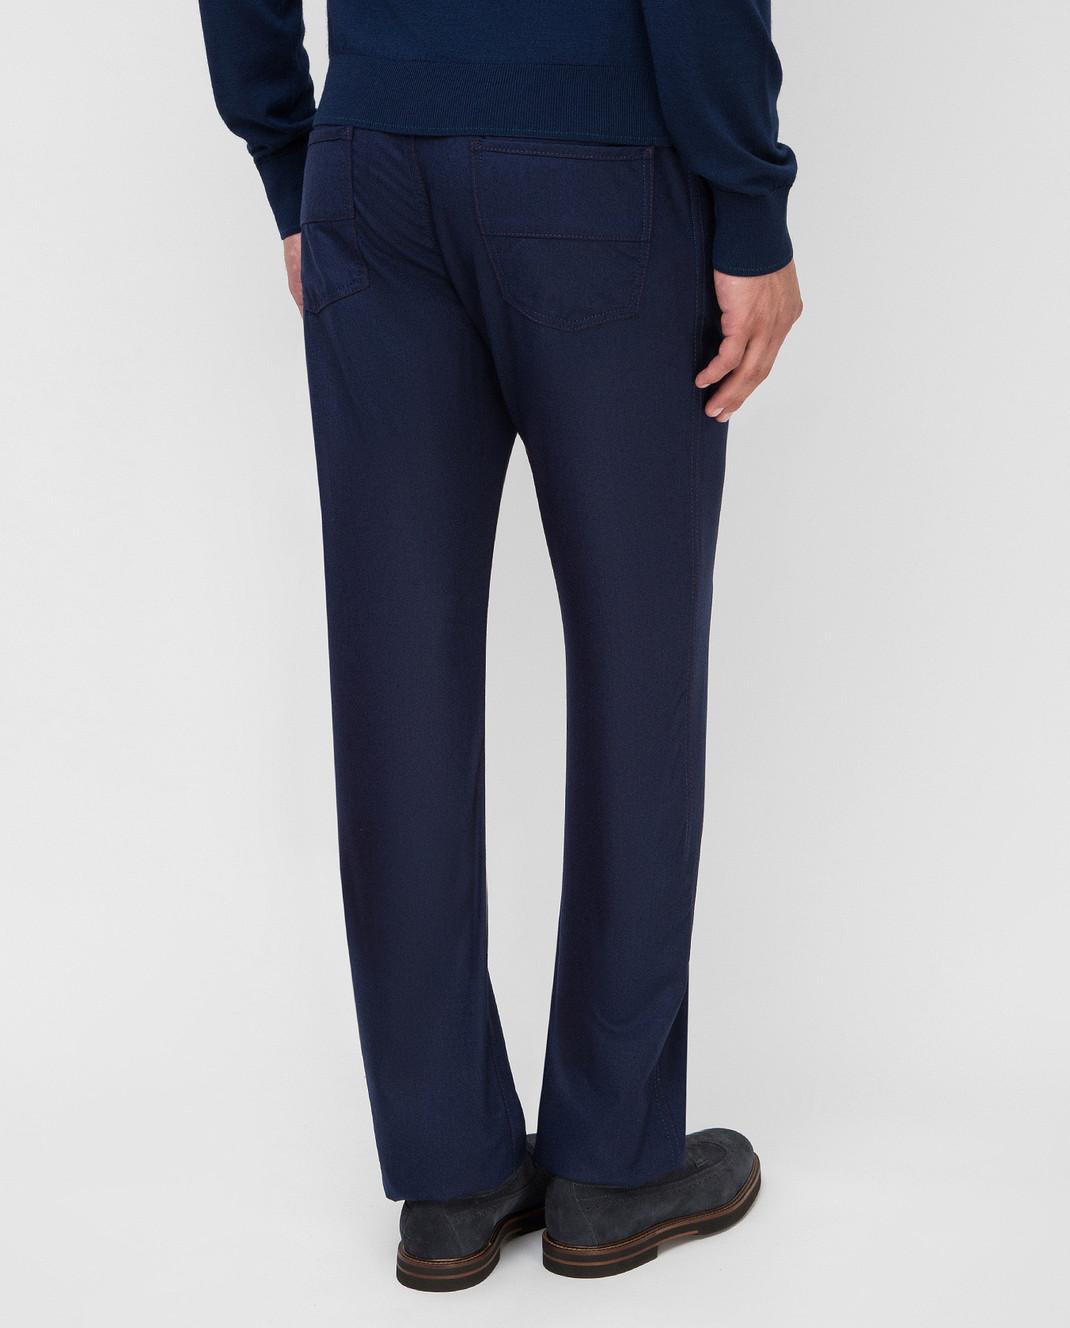 Castello d'Oro Темно-синие брюки из шерсти изображение 4